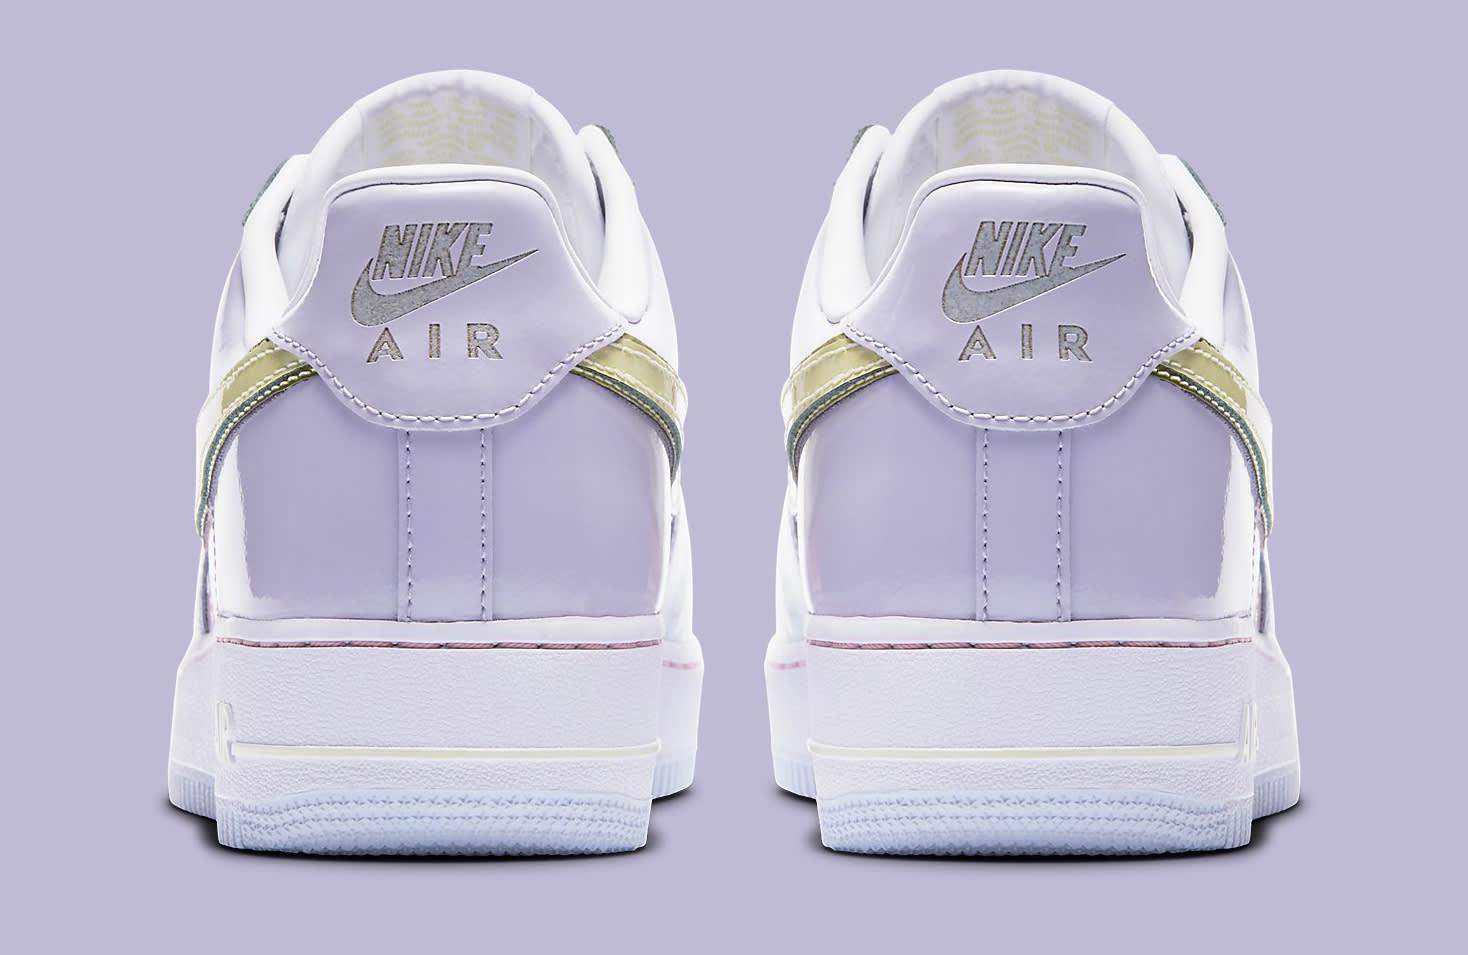 cd0171763e6735 Color TitaniumLime Ice Image via Nike Easter Egg Nike Air Force 1 2017 Heel  . ...